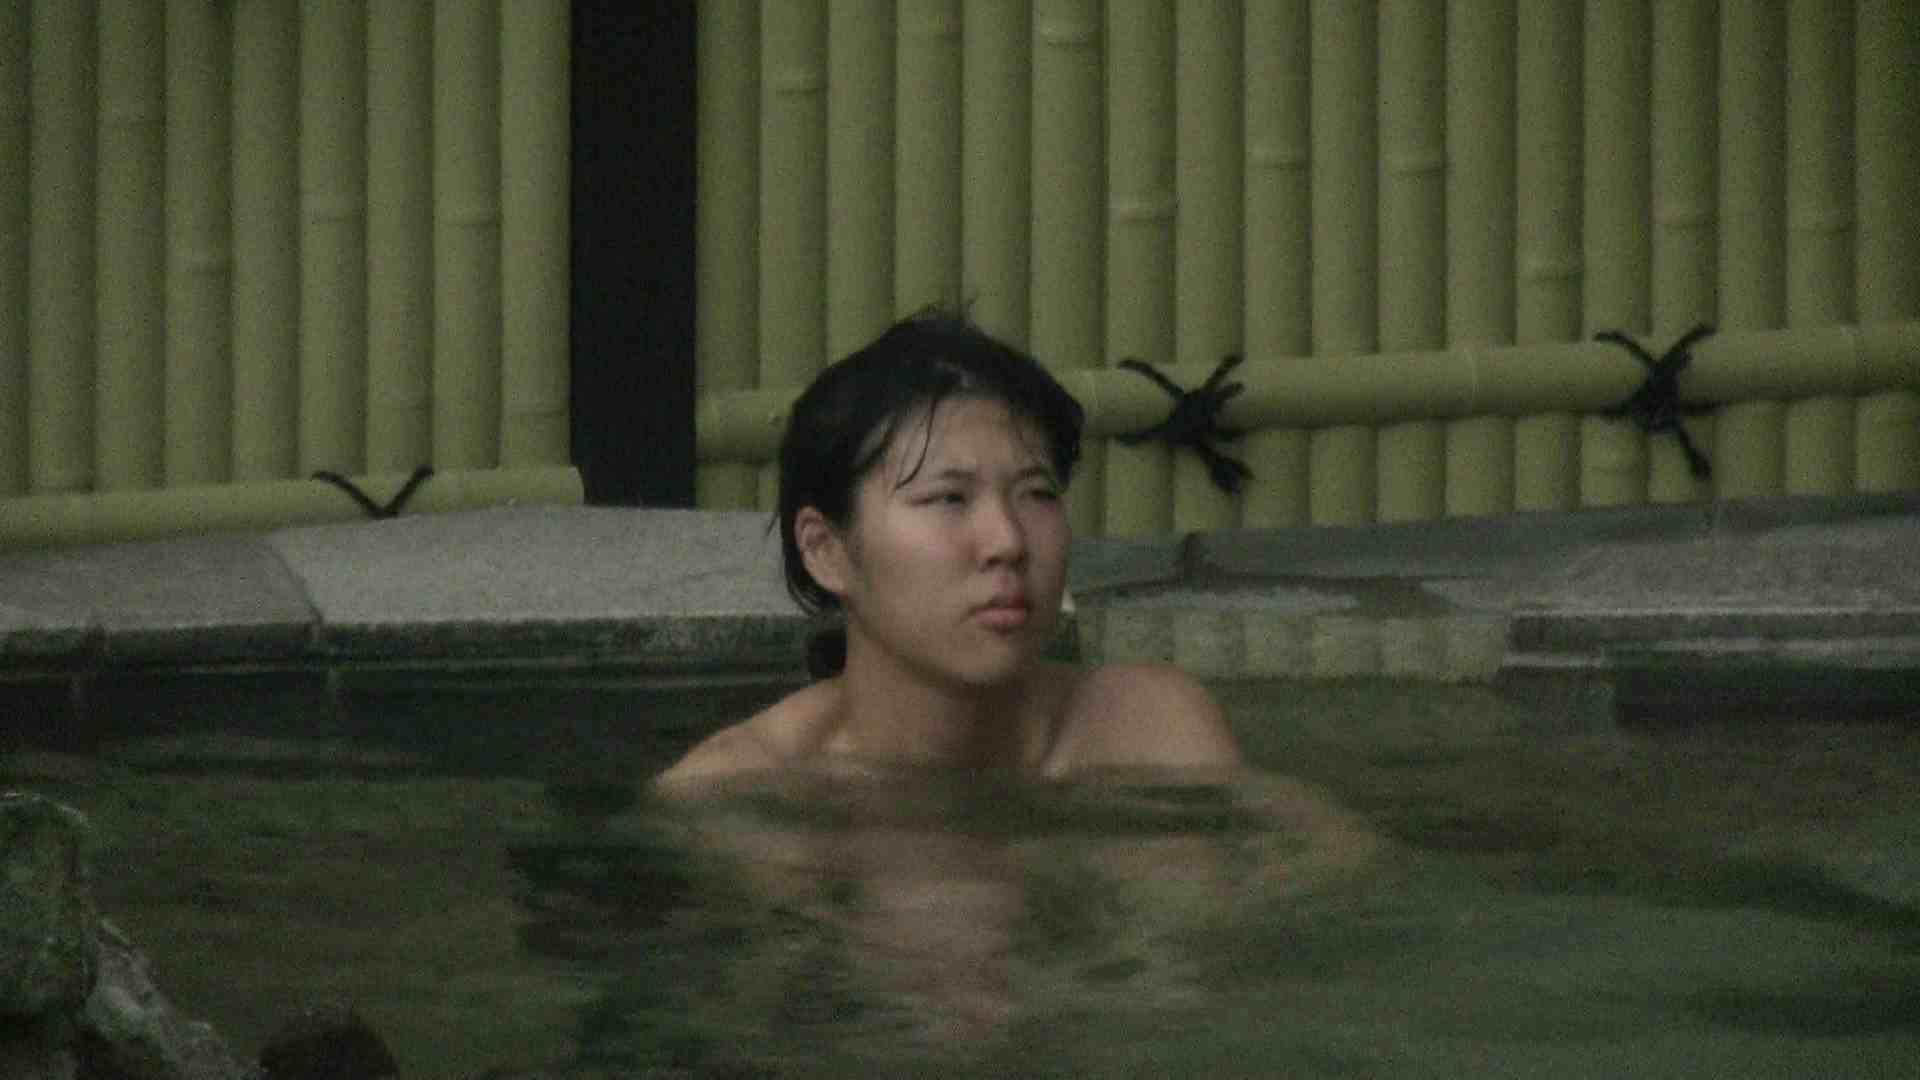 Aquaな露天風呂Vol.215 露天  74連発 6